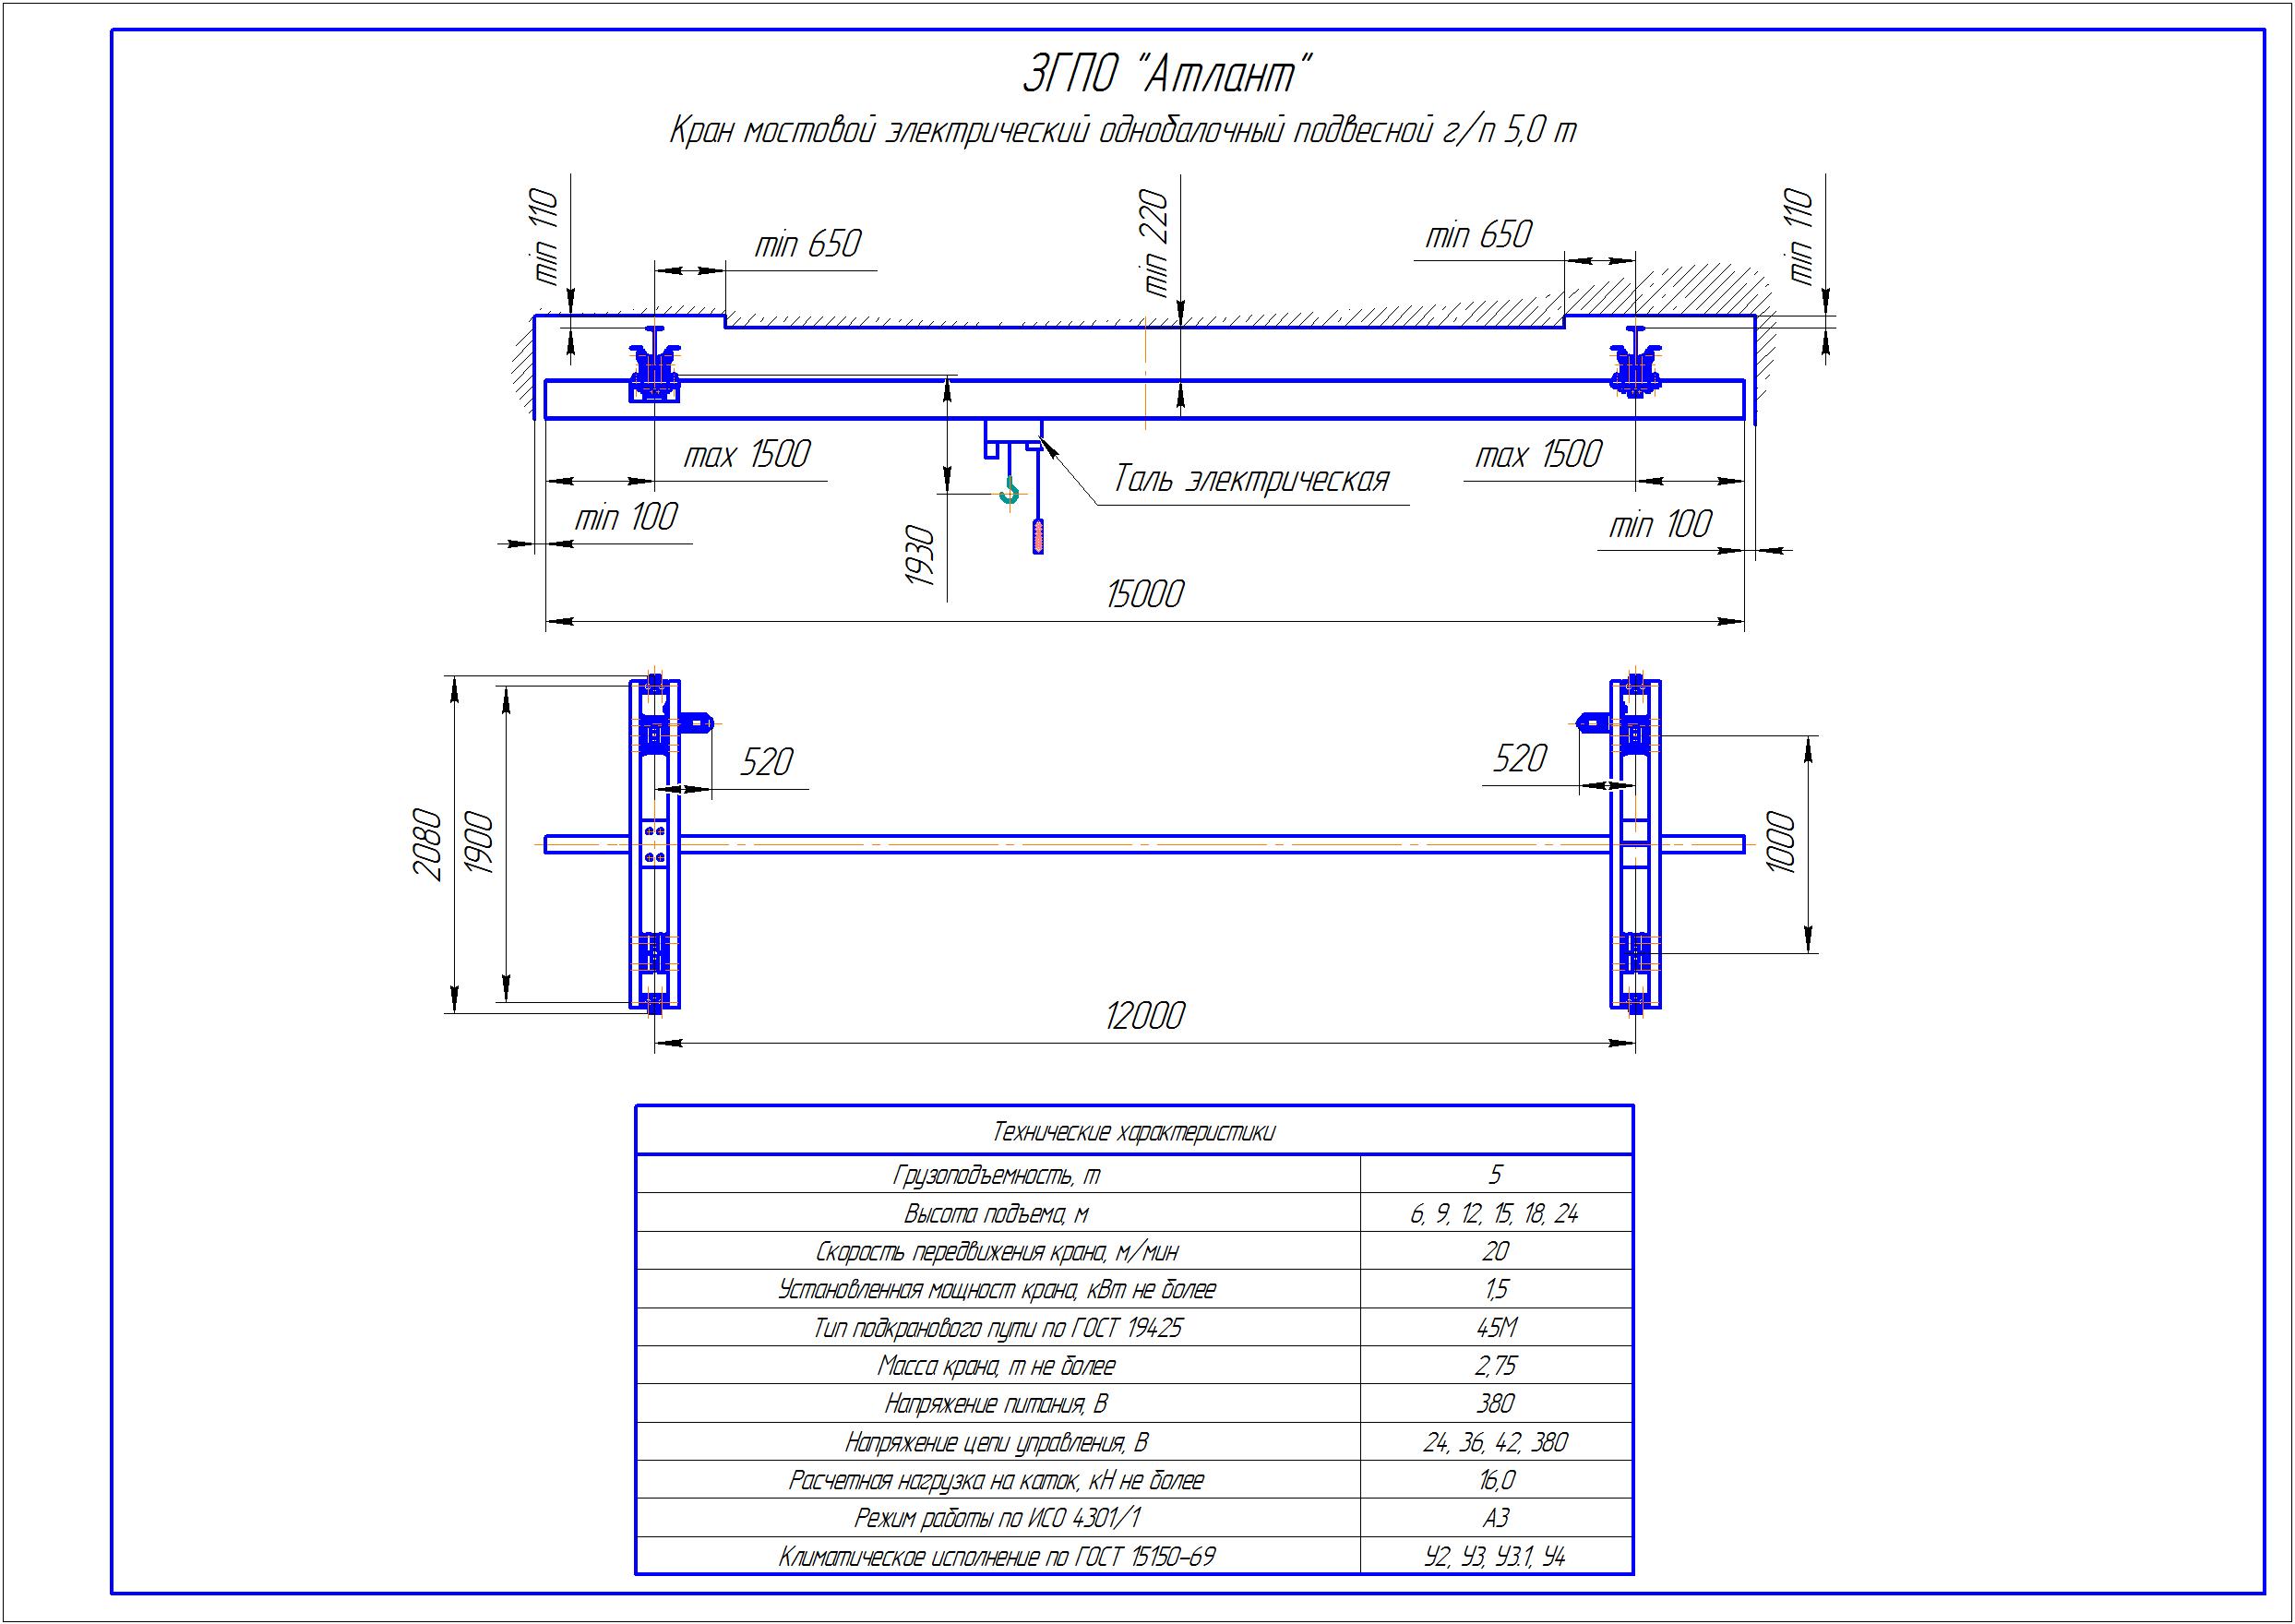 KBP 4 4 - Подвесная кран балка